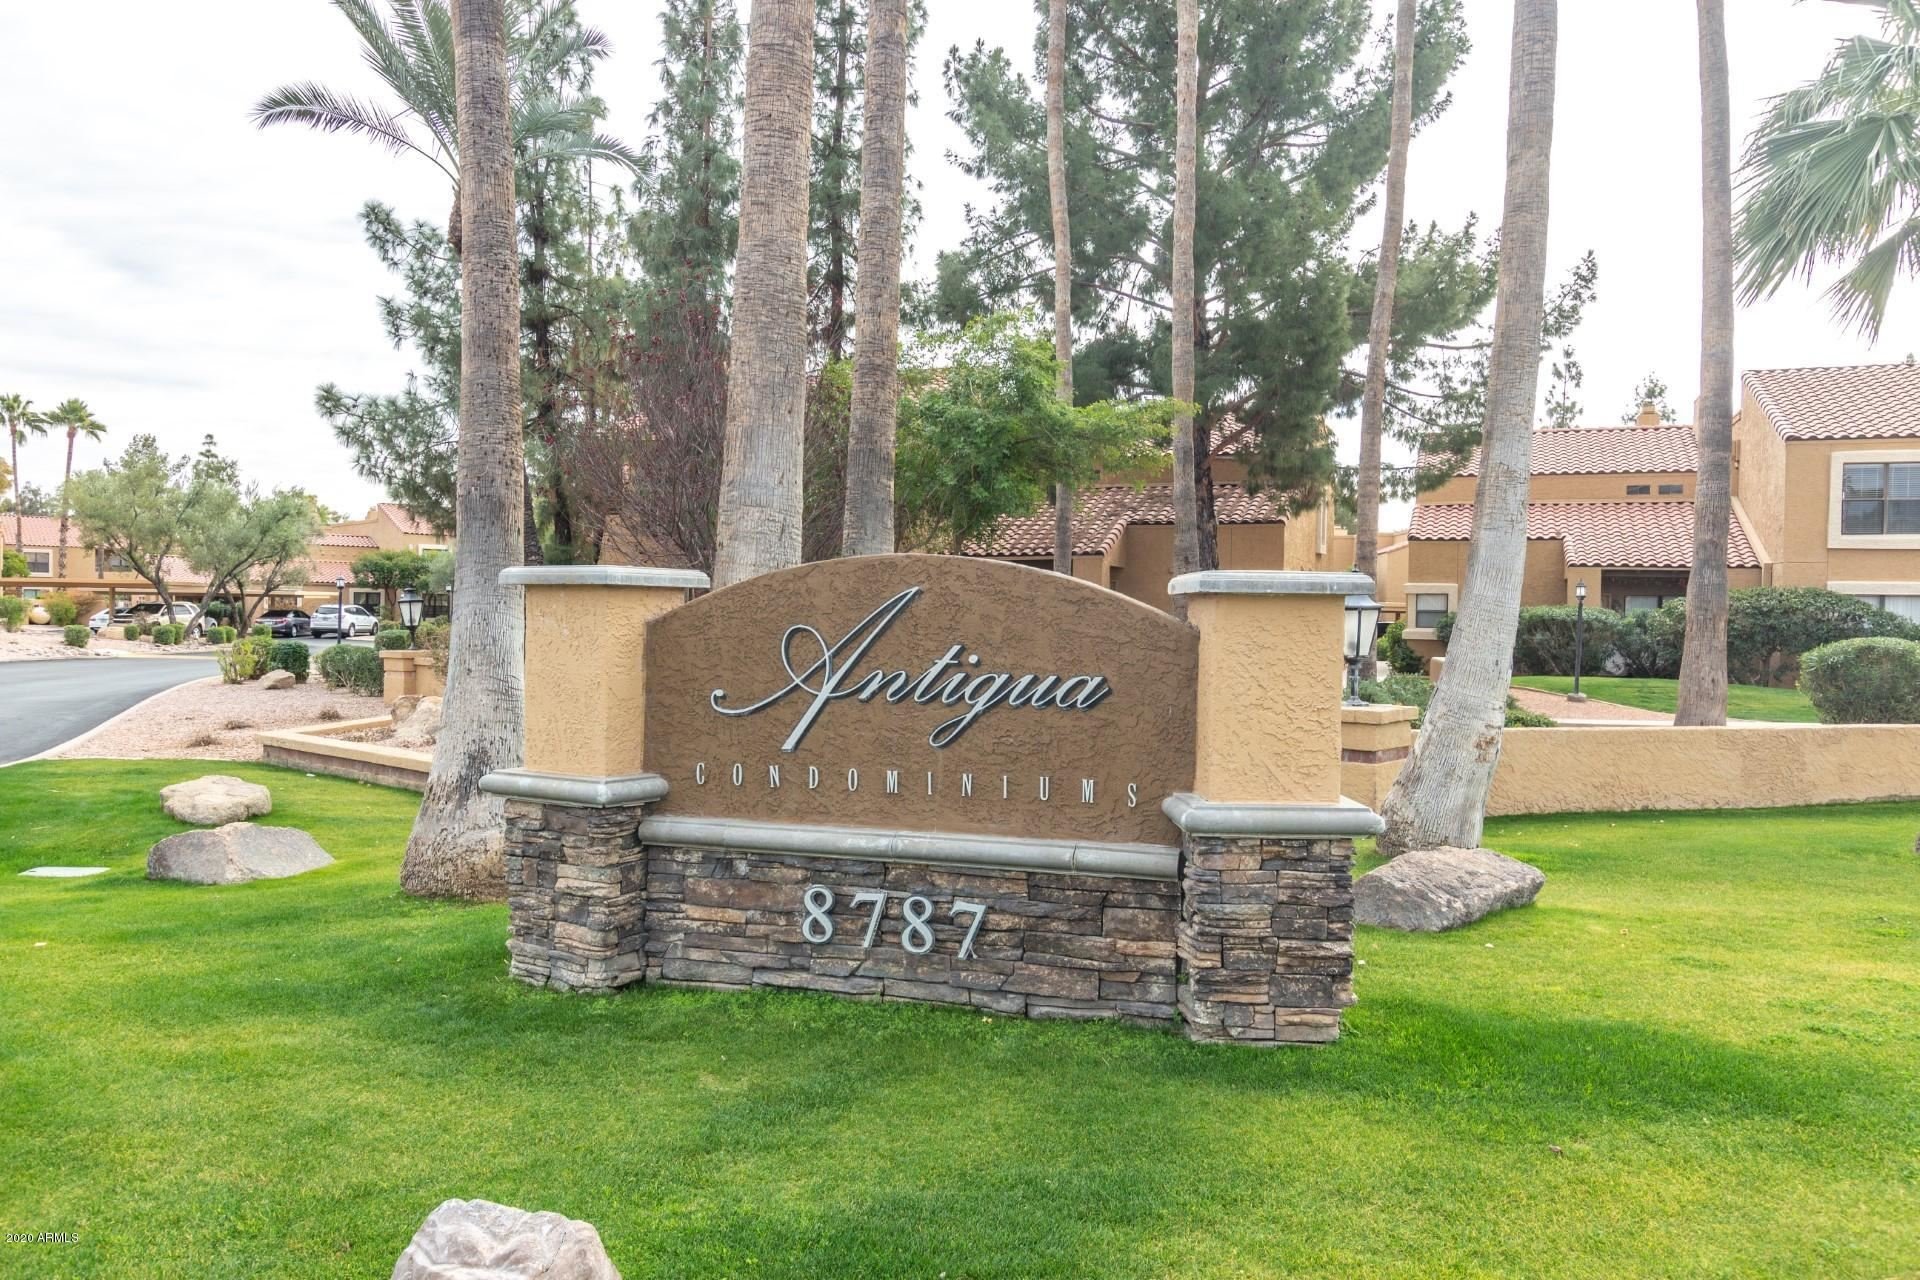 8787 E MOUNTAIN VIEW Road #2094, Scottsdale, AZ 85258 - MLS#: 6127014